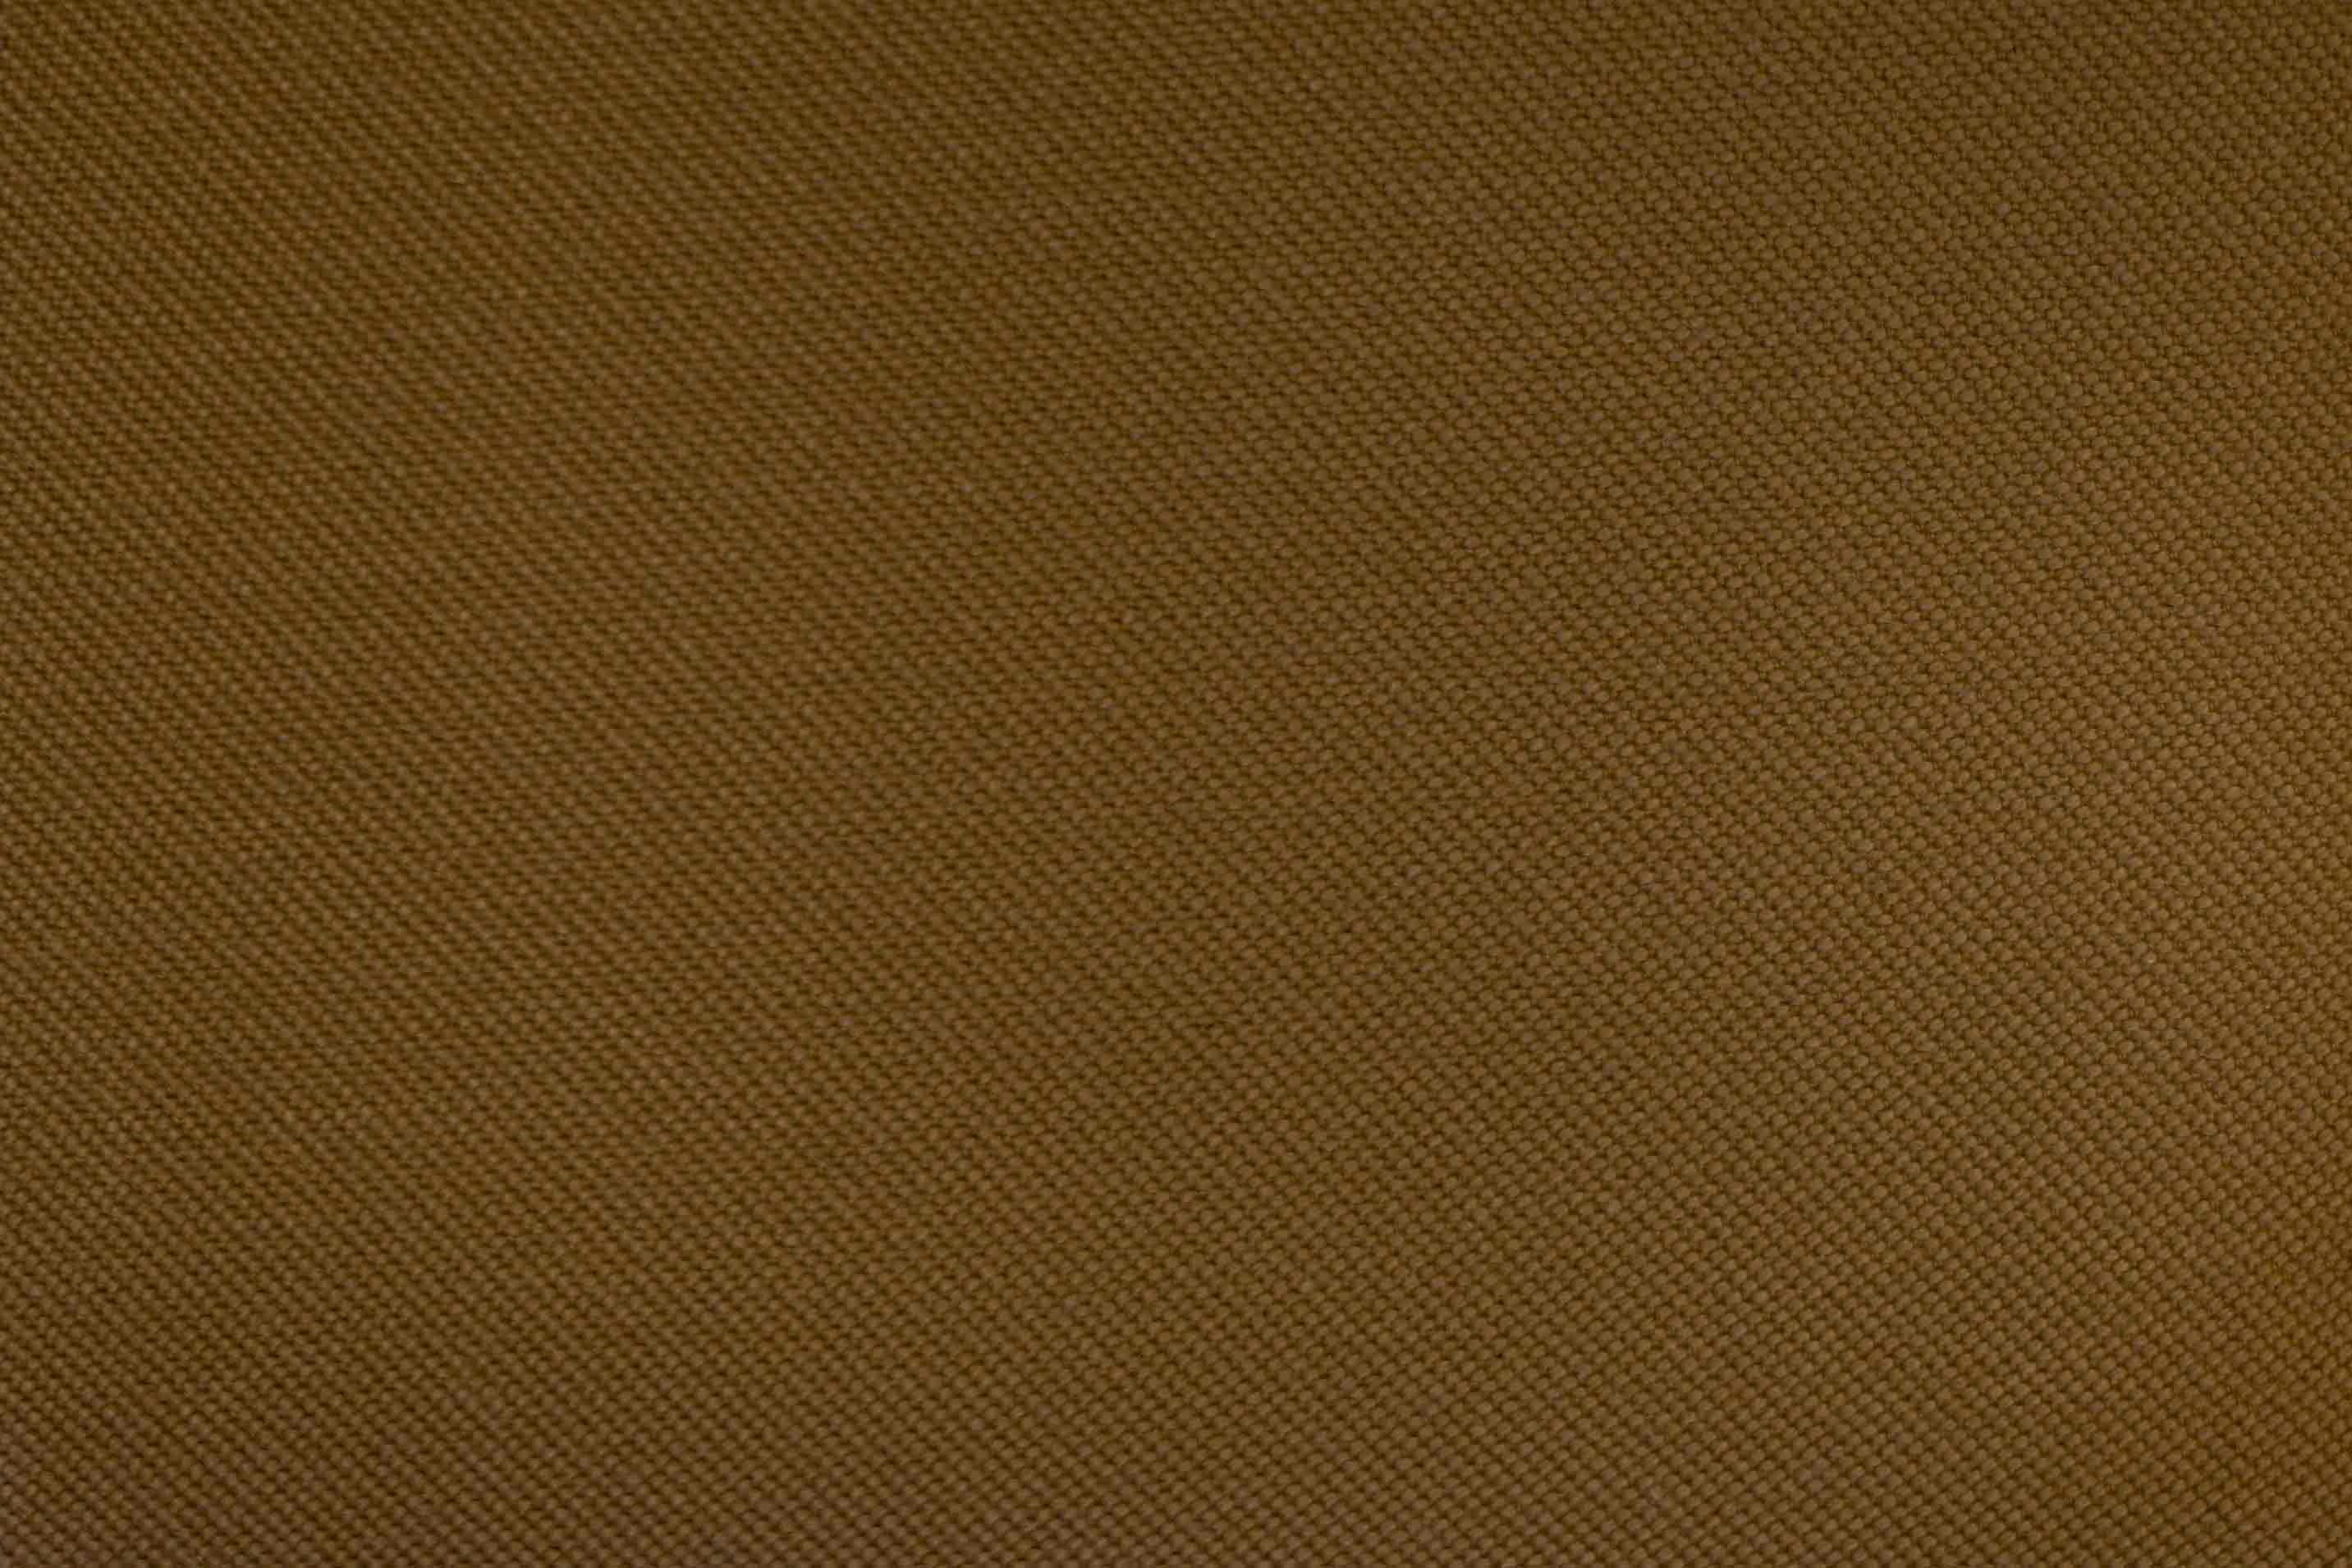 Tejido 116 beige oscuro (parte interior beige) (+20 €)